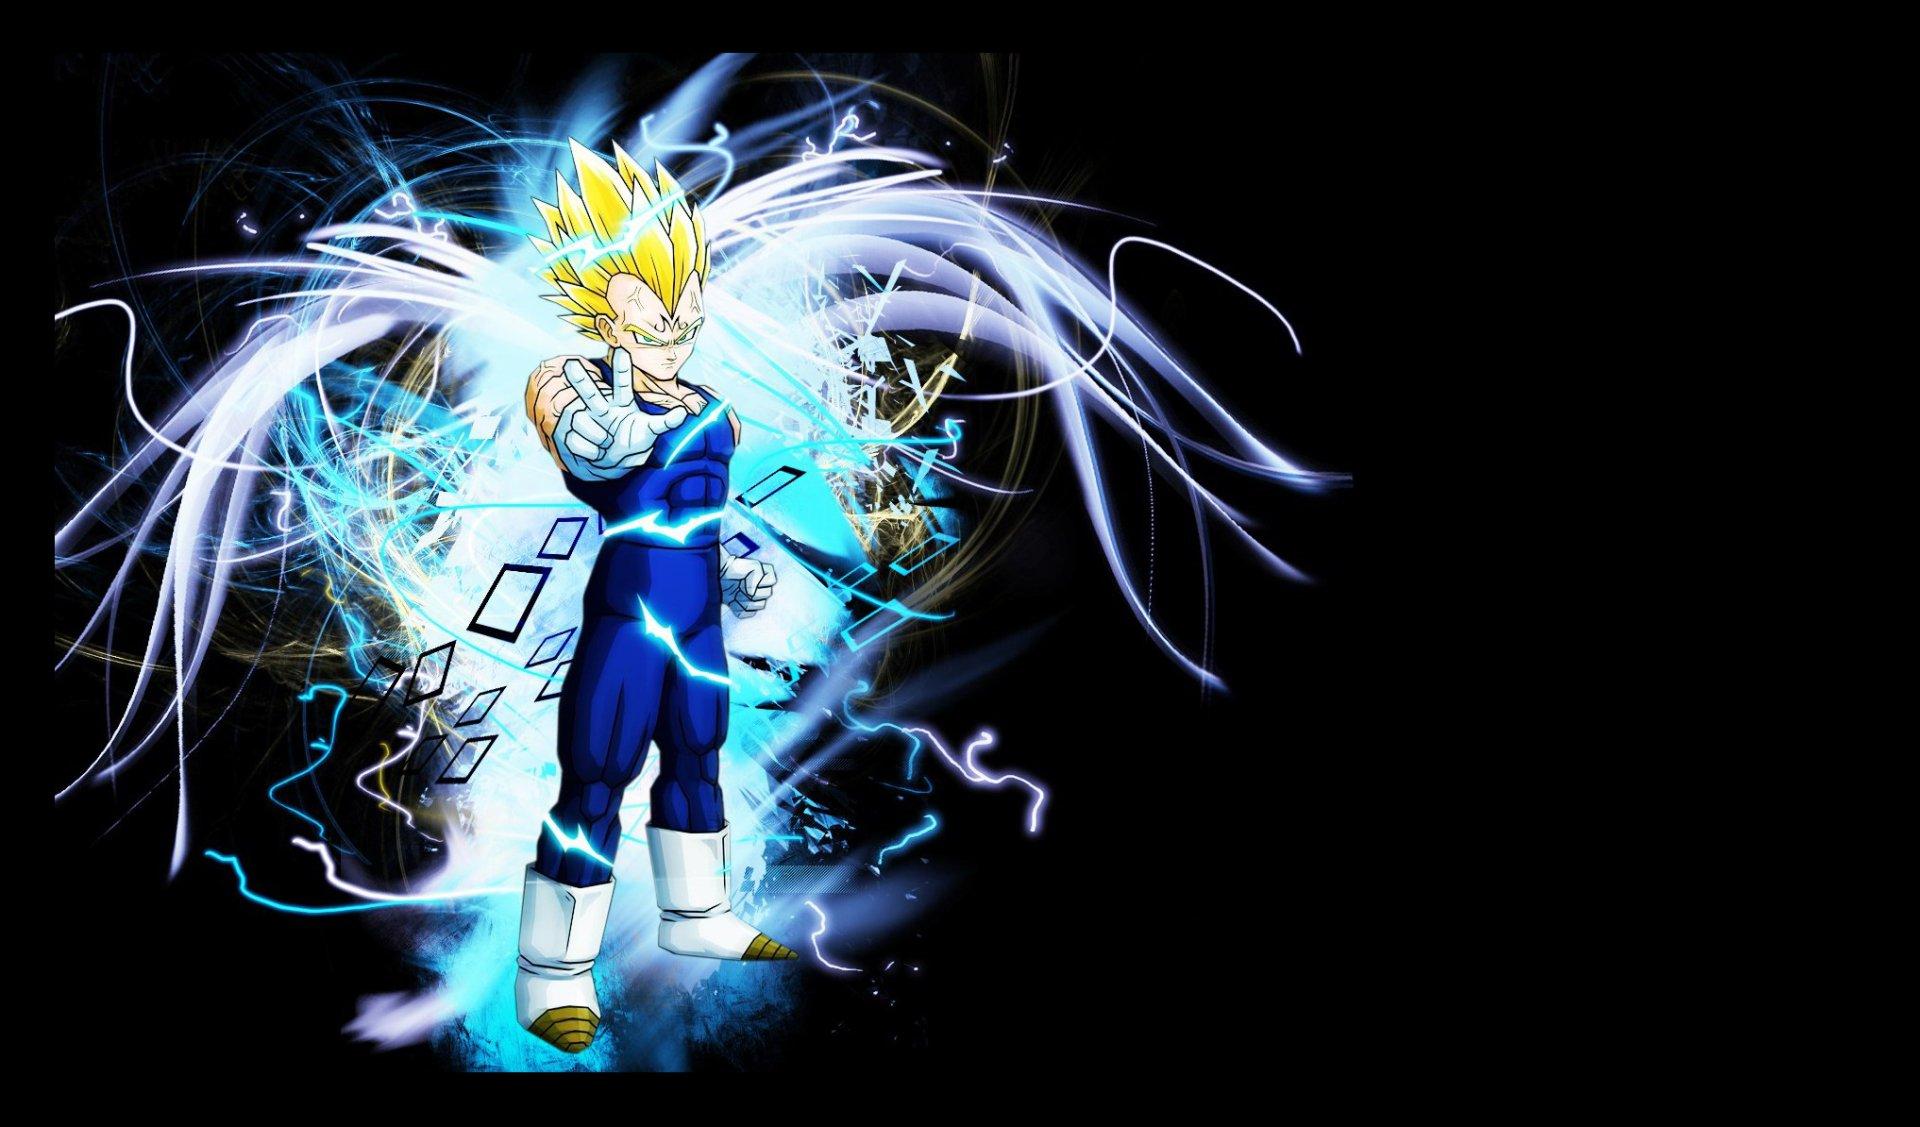 Dragon Ball Z Full HD Fond d'écran and Arrière-Plan | 2034x1194 | ID:578218